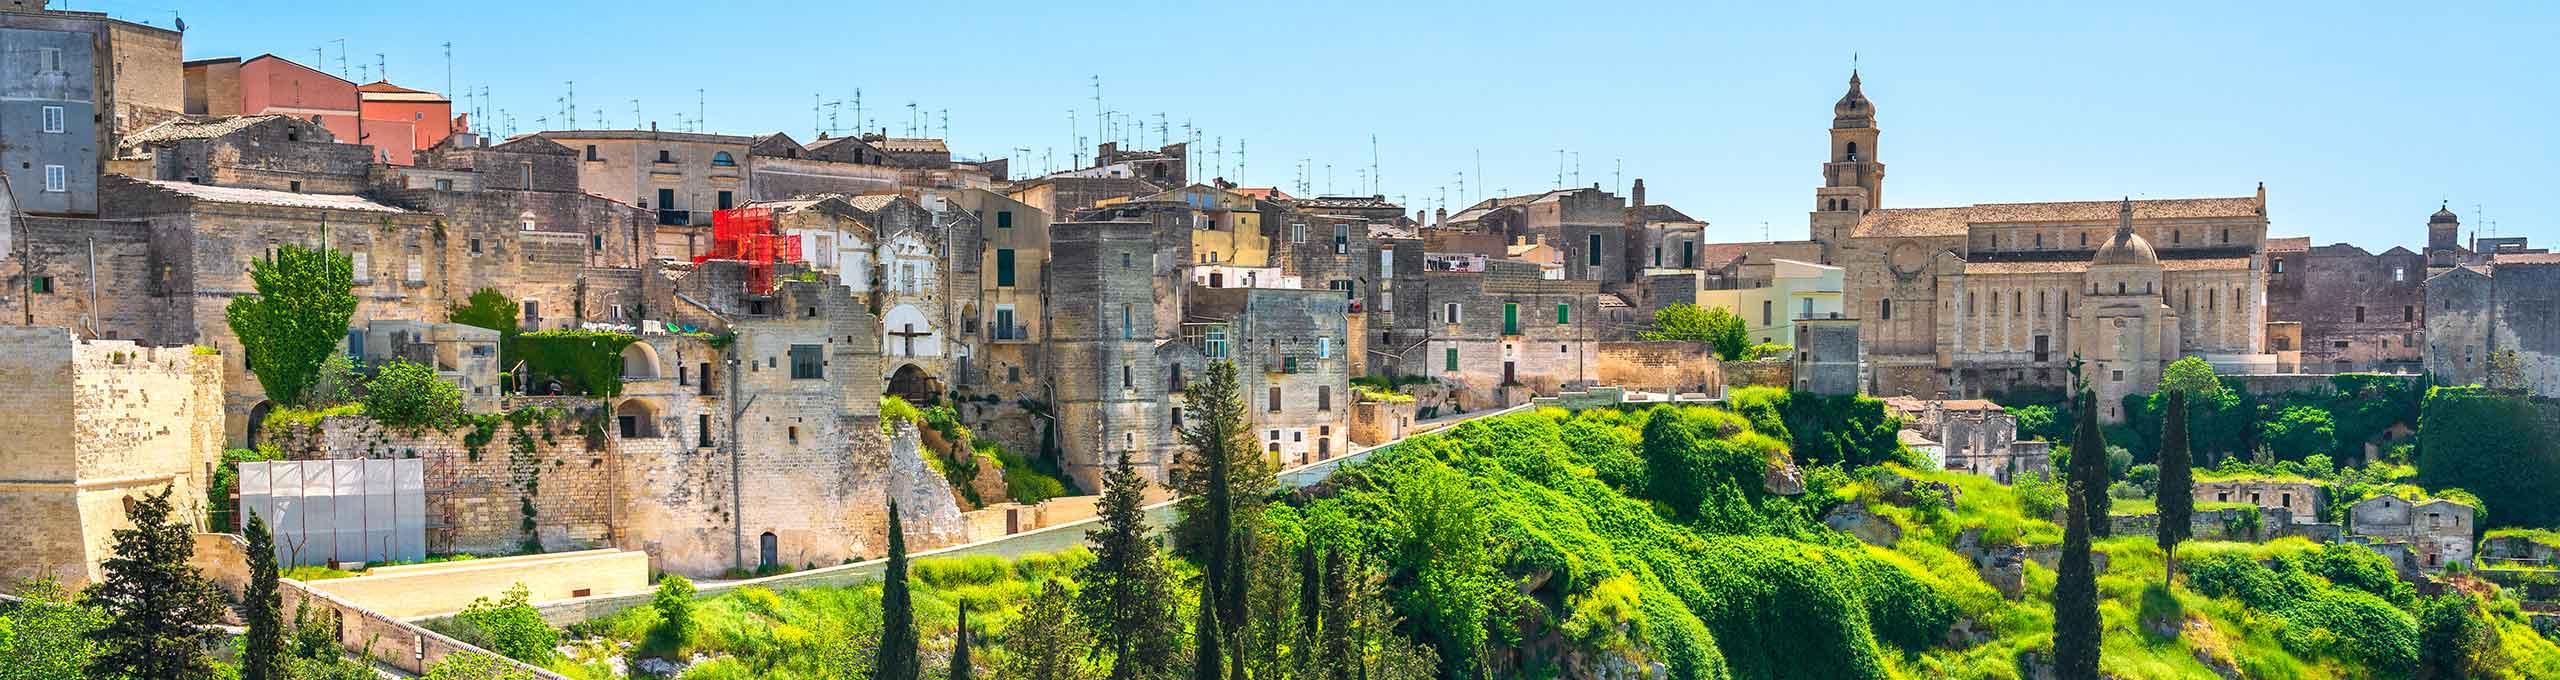 Gravina in Puglia, Murge